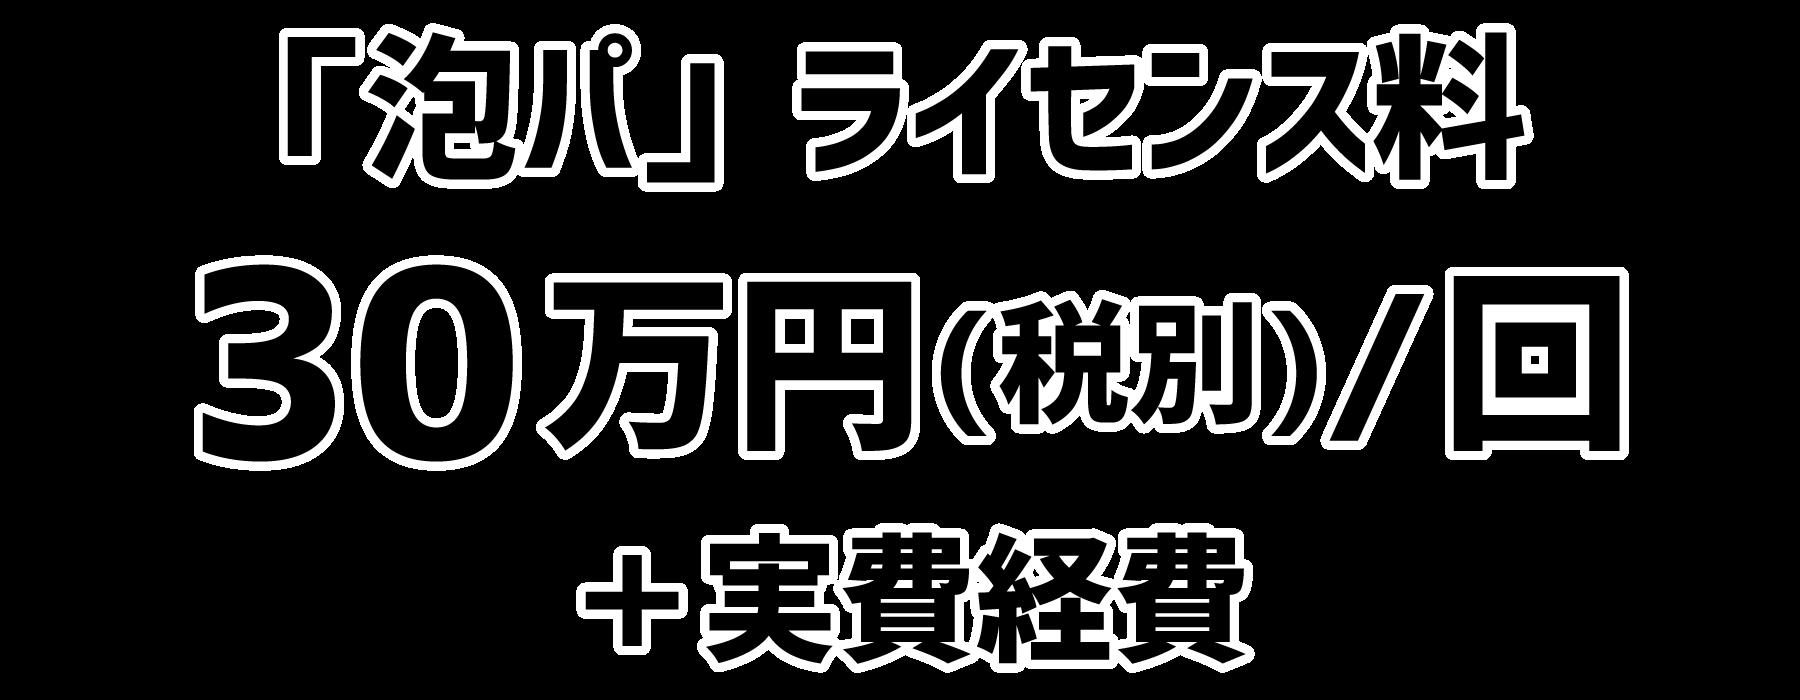 lp_text_03